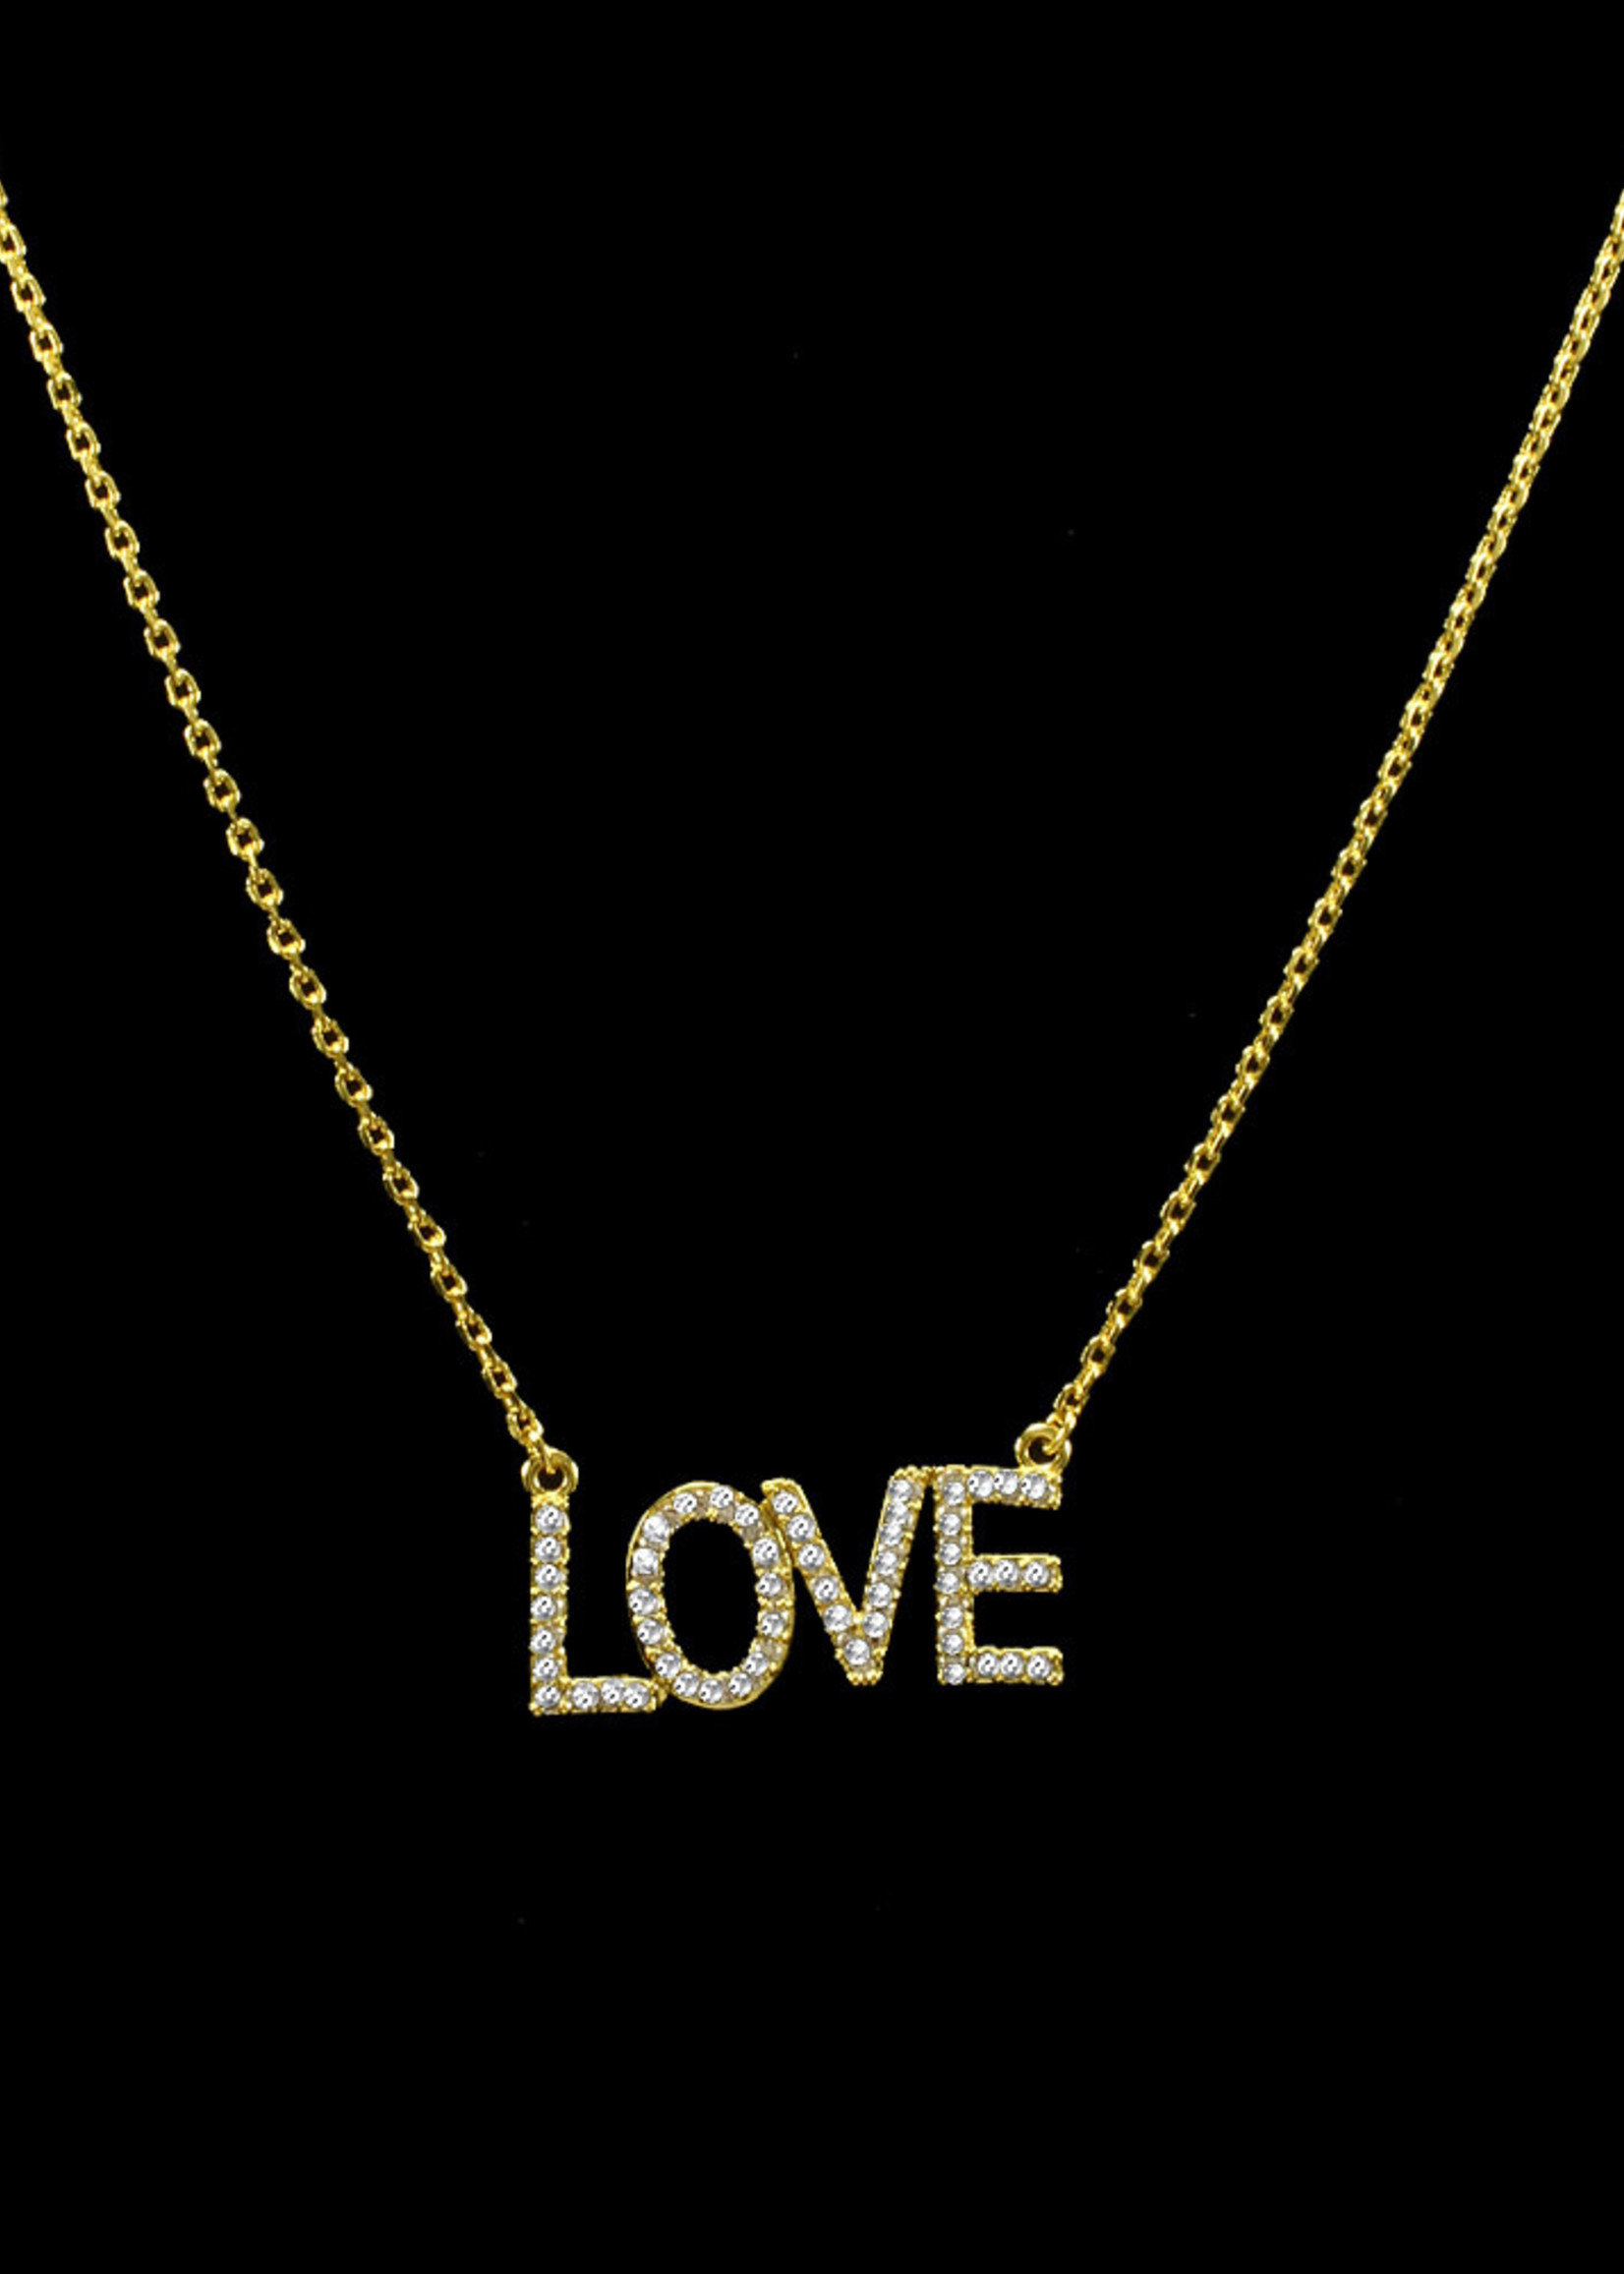 Be-Je Designs Beje - Love Necklace (PU4605N)